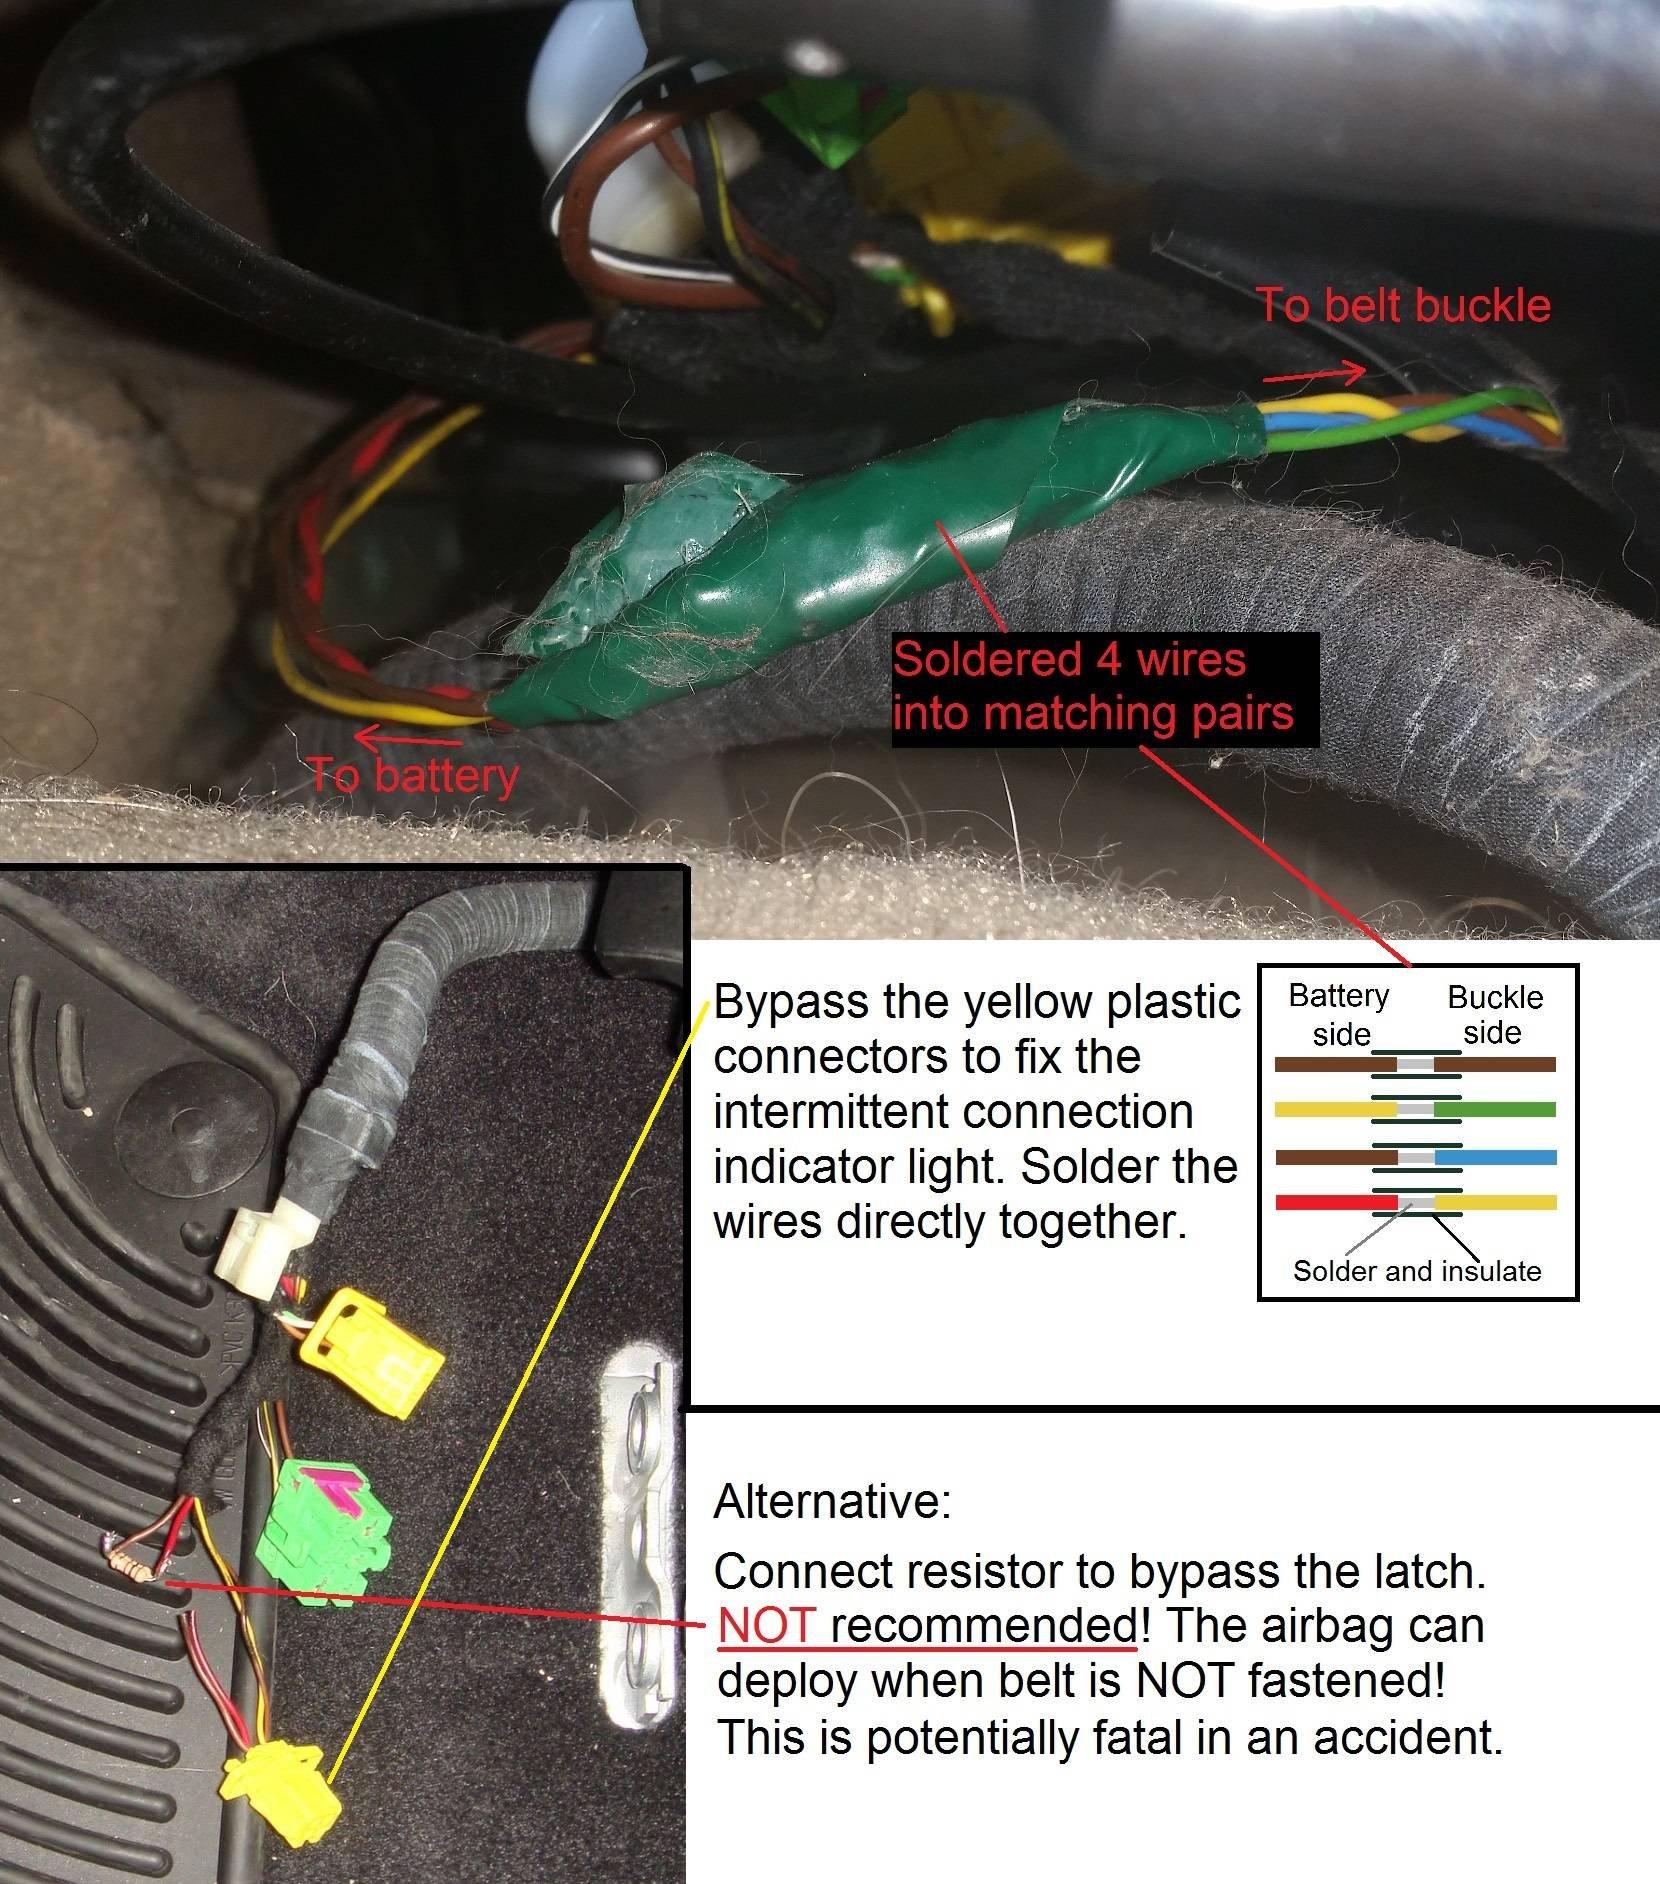 Solder wires driver